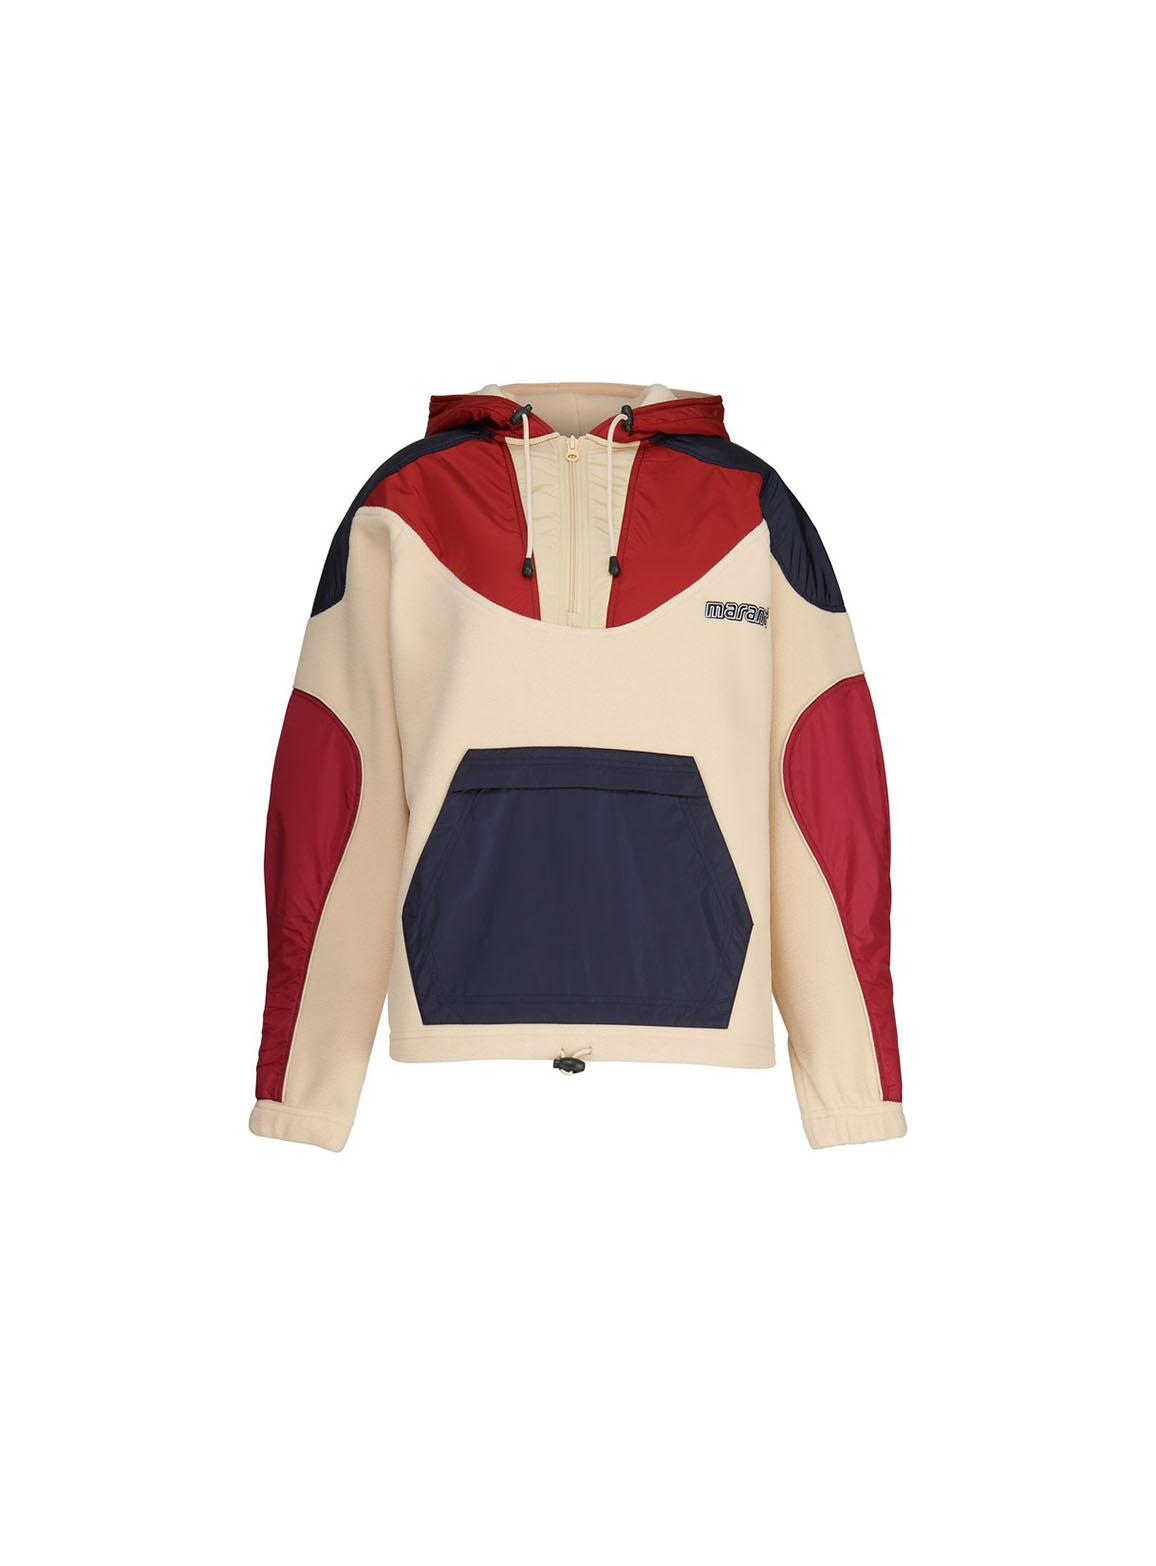 Mantsy Jacket